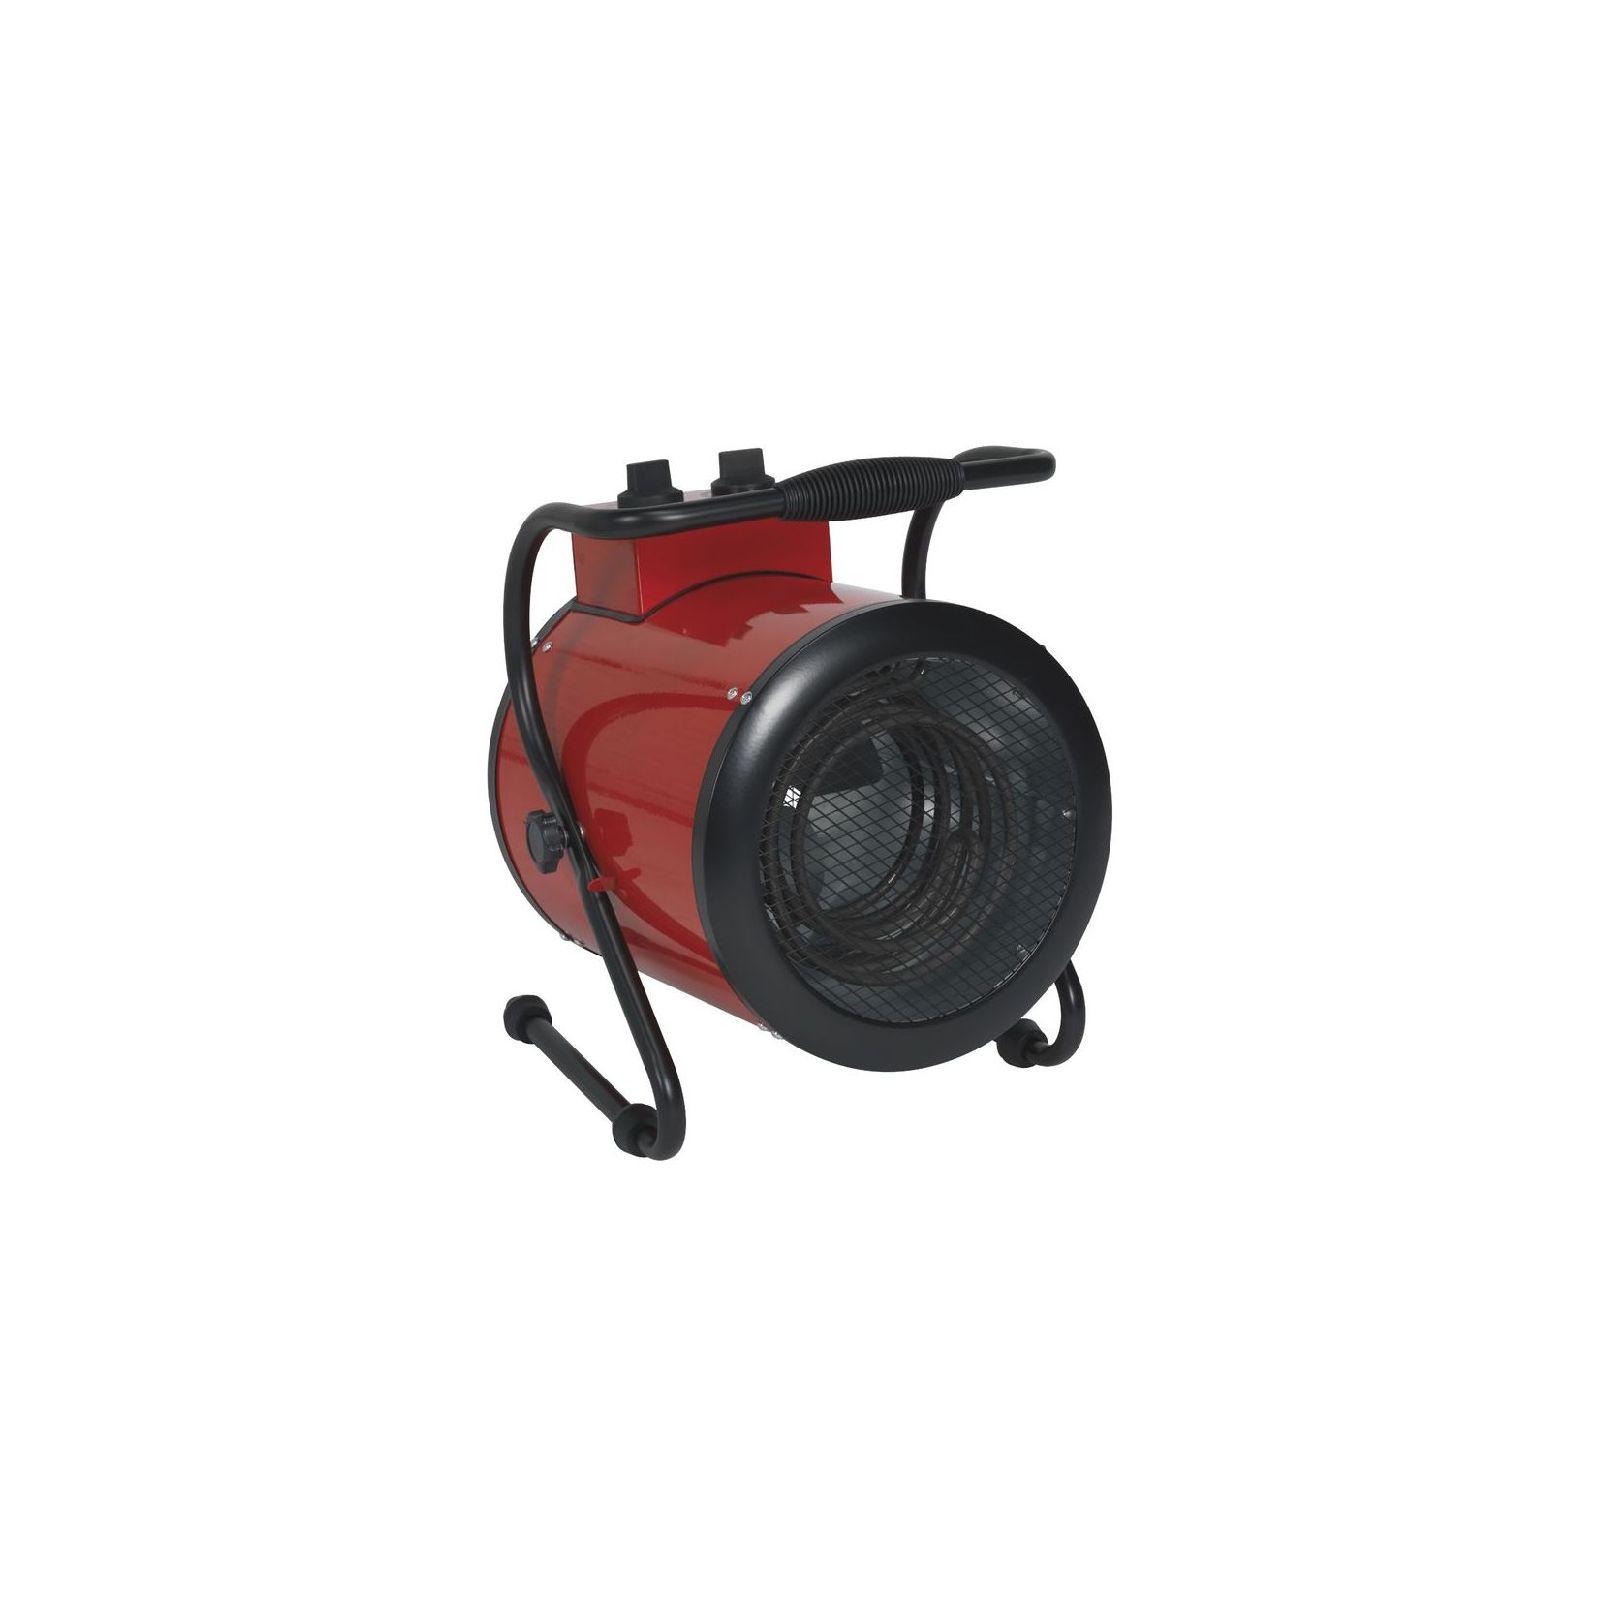 sealey industrial fan heater 3kw 2 heat settings electric. Black Bedroom Furniture Sets. Home Design Ideas